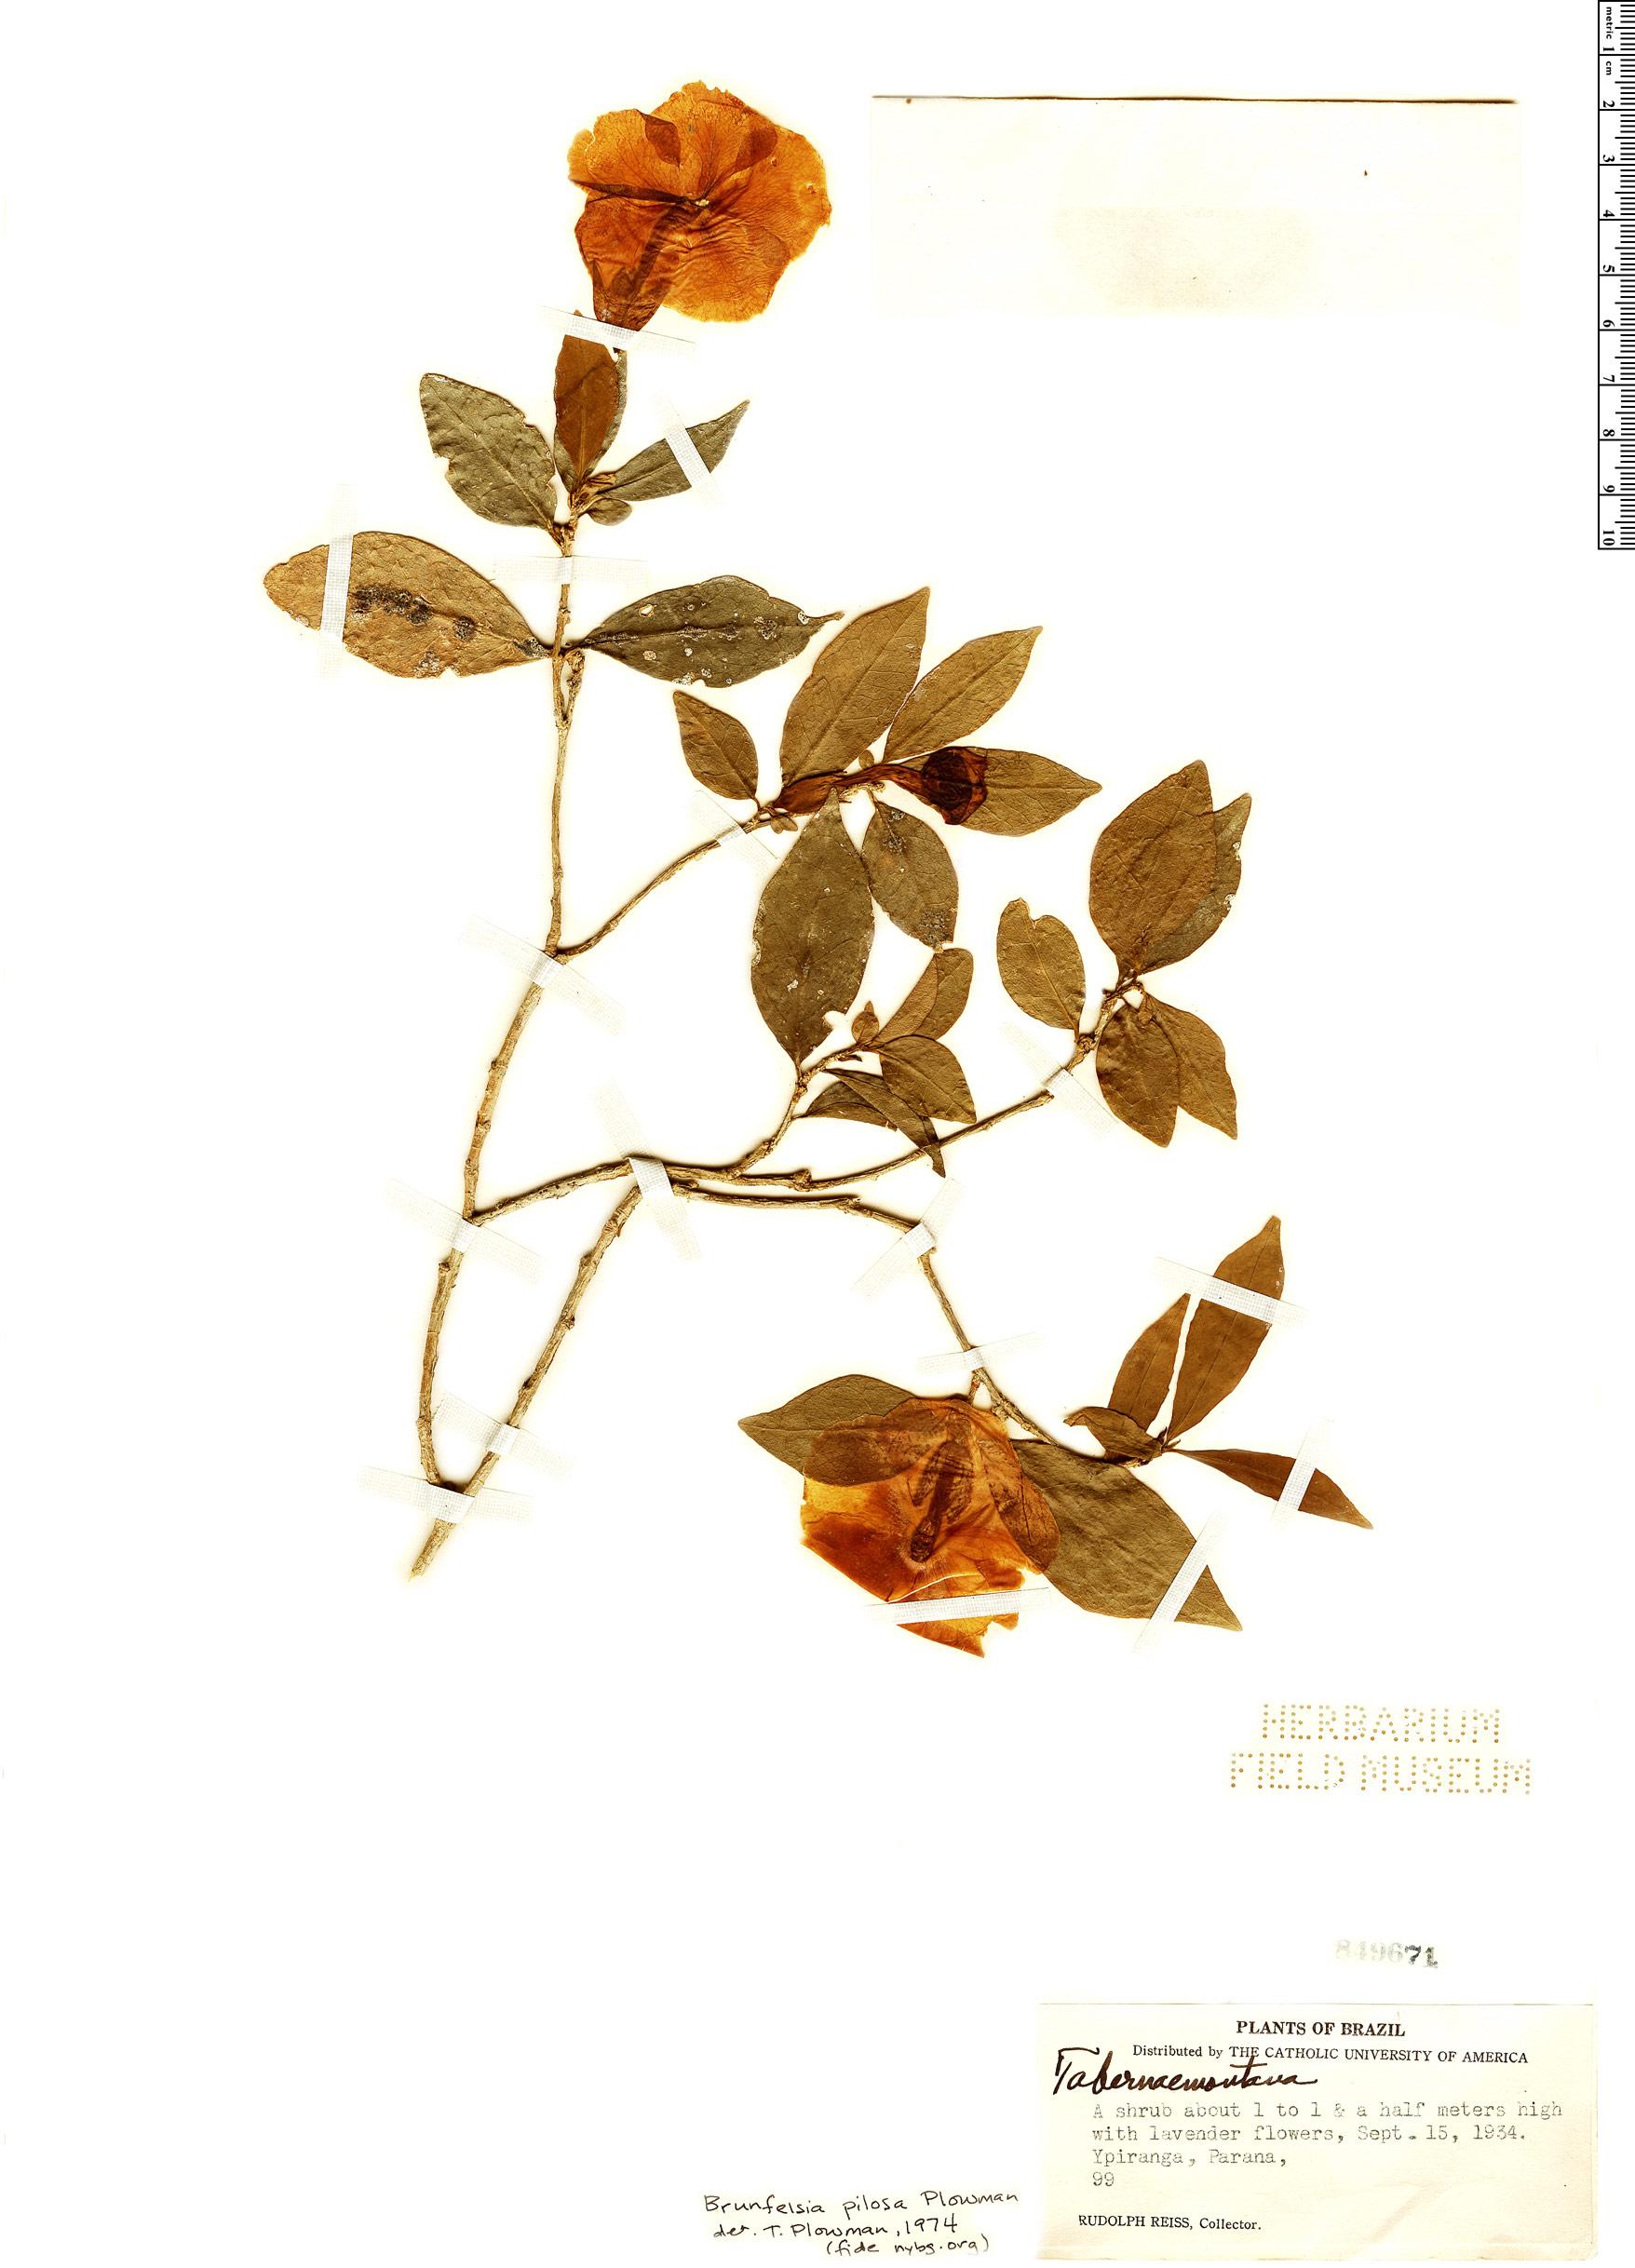 Specimen: Brunfelsia pilosa